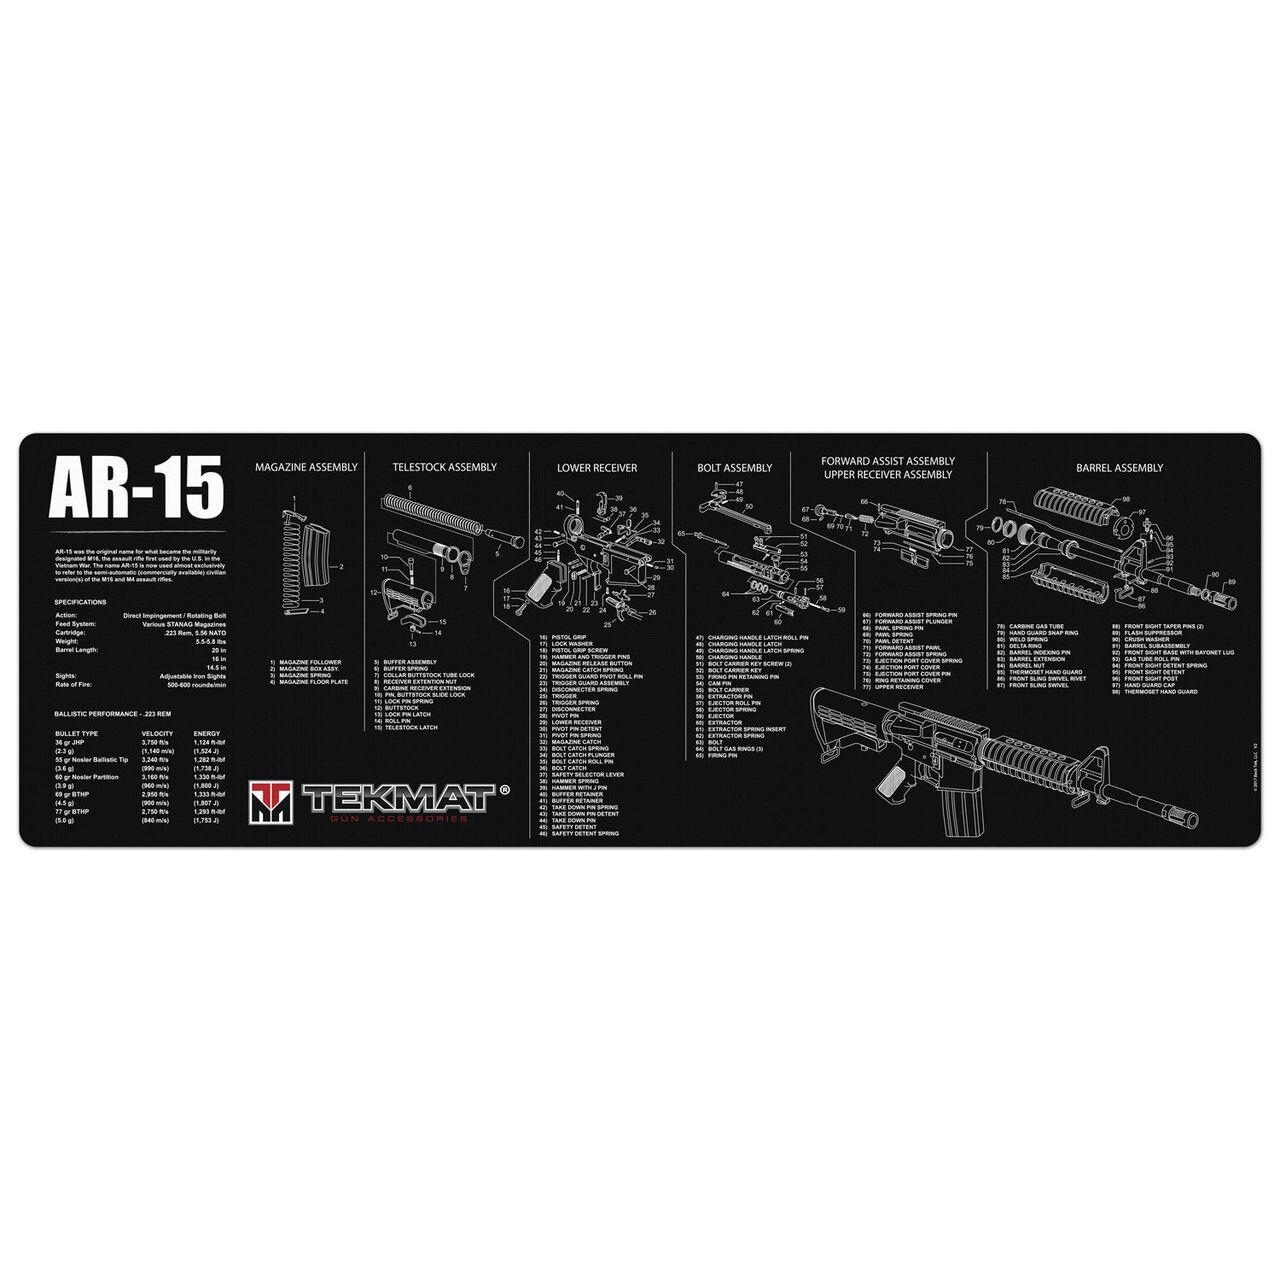 small resolution of tekmat gun accessories armorer s bench tekmat ar 15 schematic mat ar 15 diagram 3 major components ar 15 diagram mat